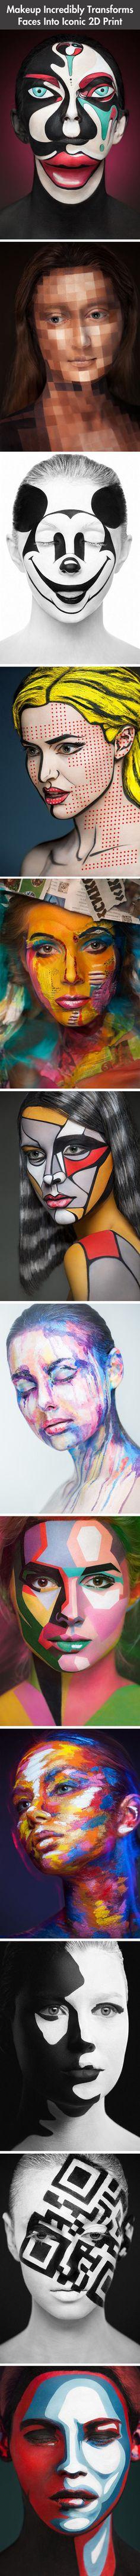 Makeup Transforms Faces Into Amazing 2D Prints – 12 Pics